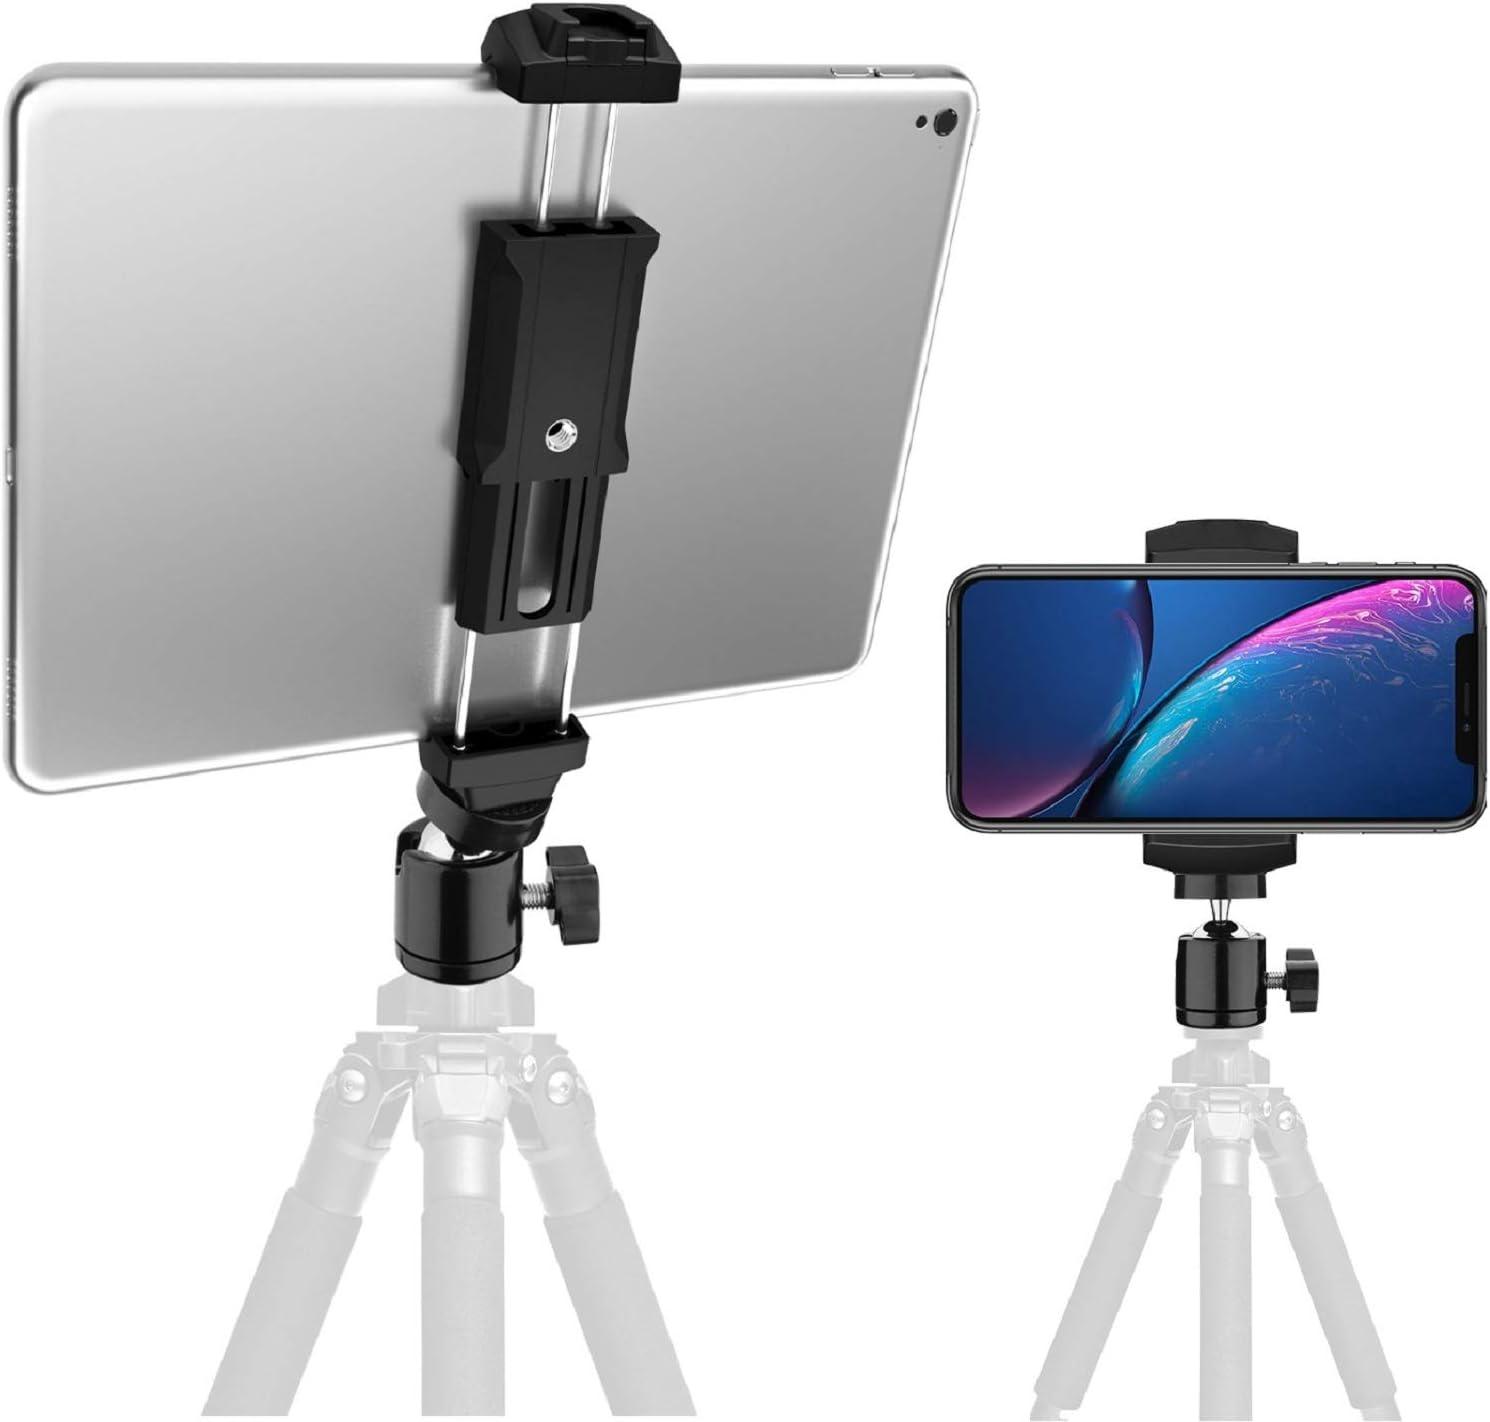 iPad Mount for Tripods with Ball Head /& Bluetooth Remote Shutter TabMount 360 KobraTech iPad Tripod Mount